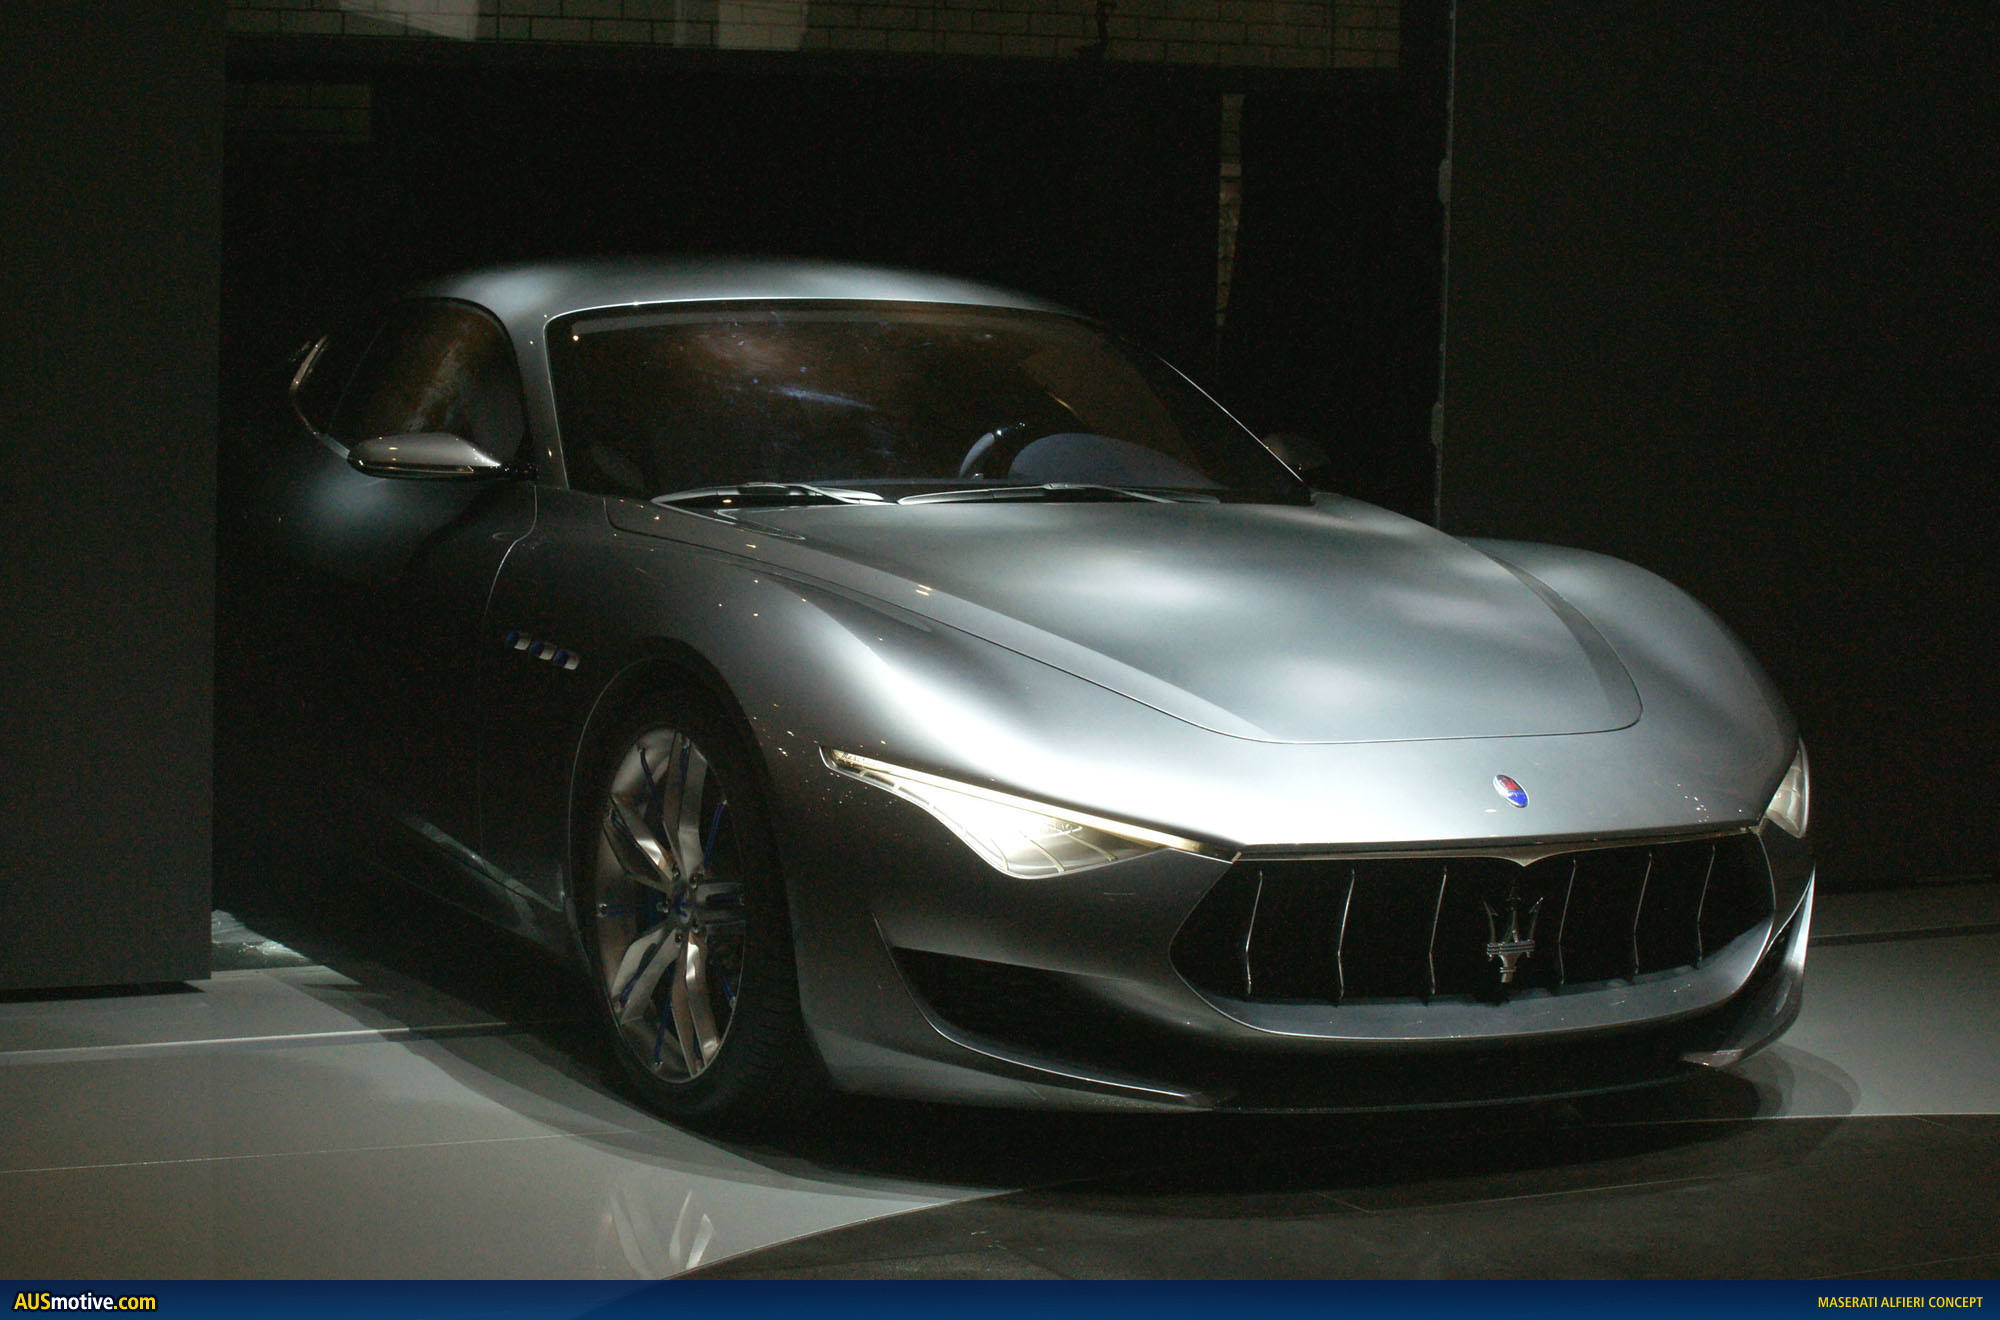 How Much Are Maseratis >> AUSmotive.com » Maserati Alfieri concept